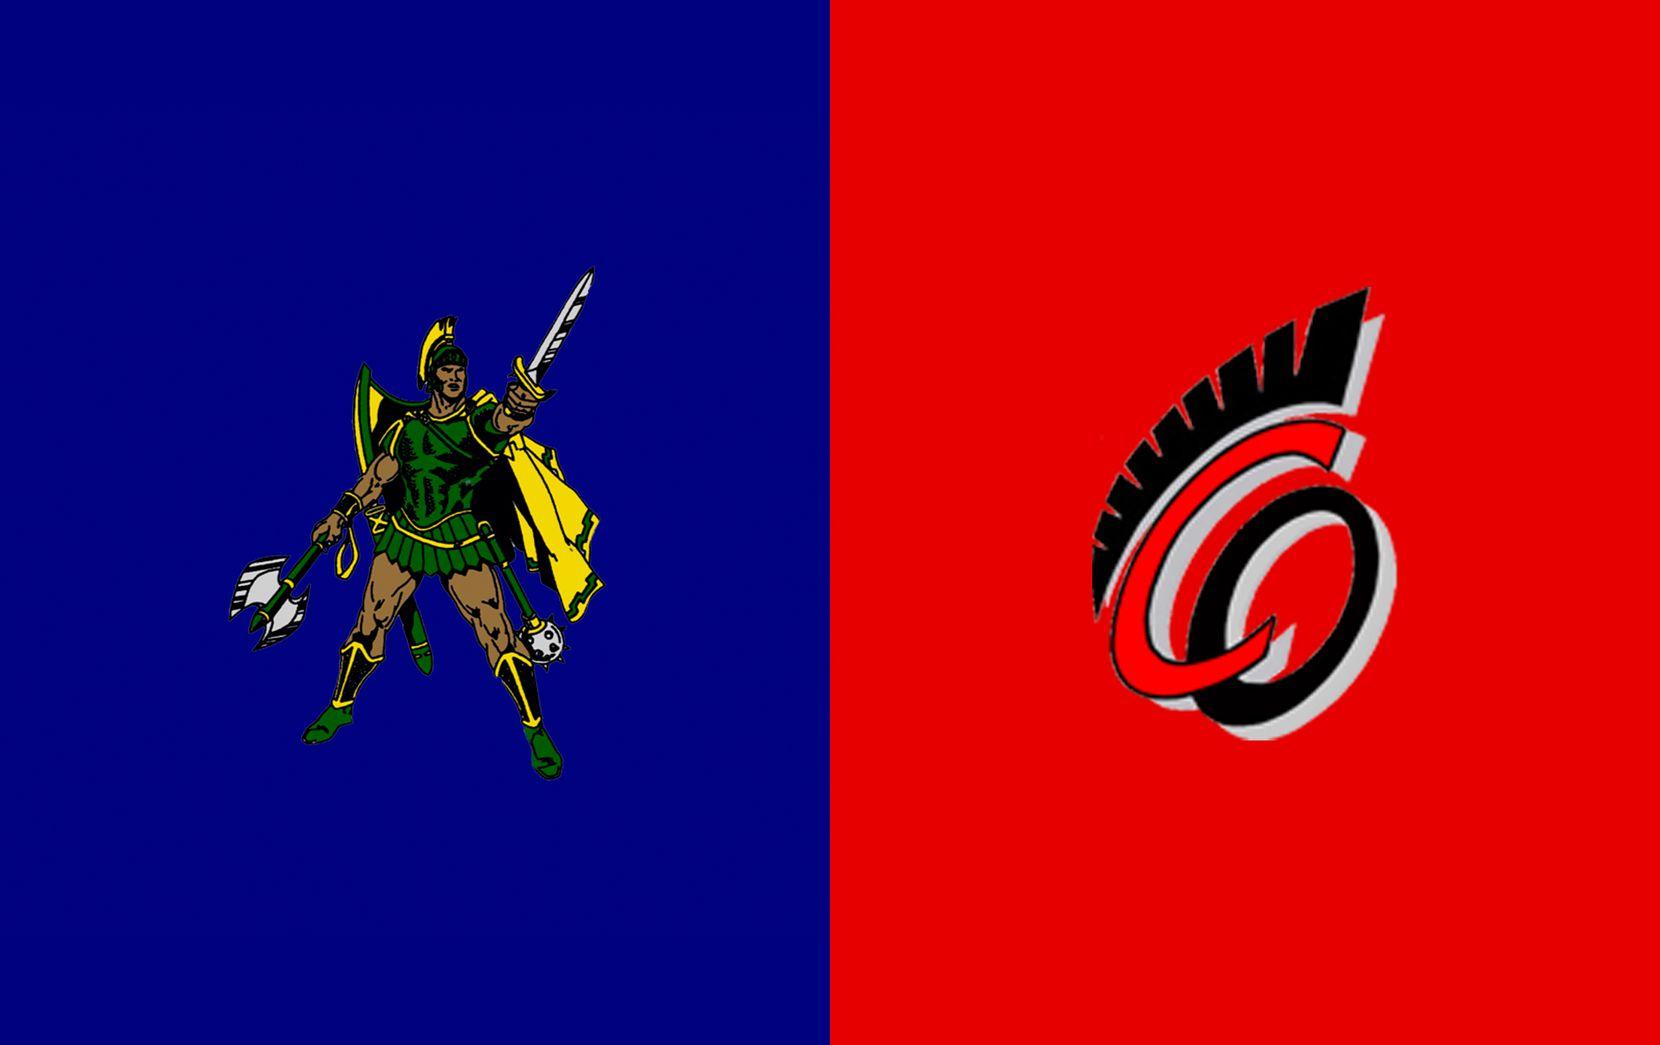 Madison vs. Coldhurst-Oakspring.